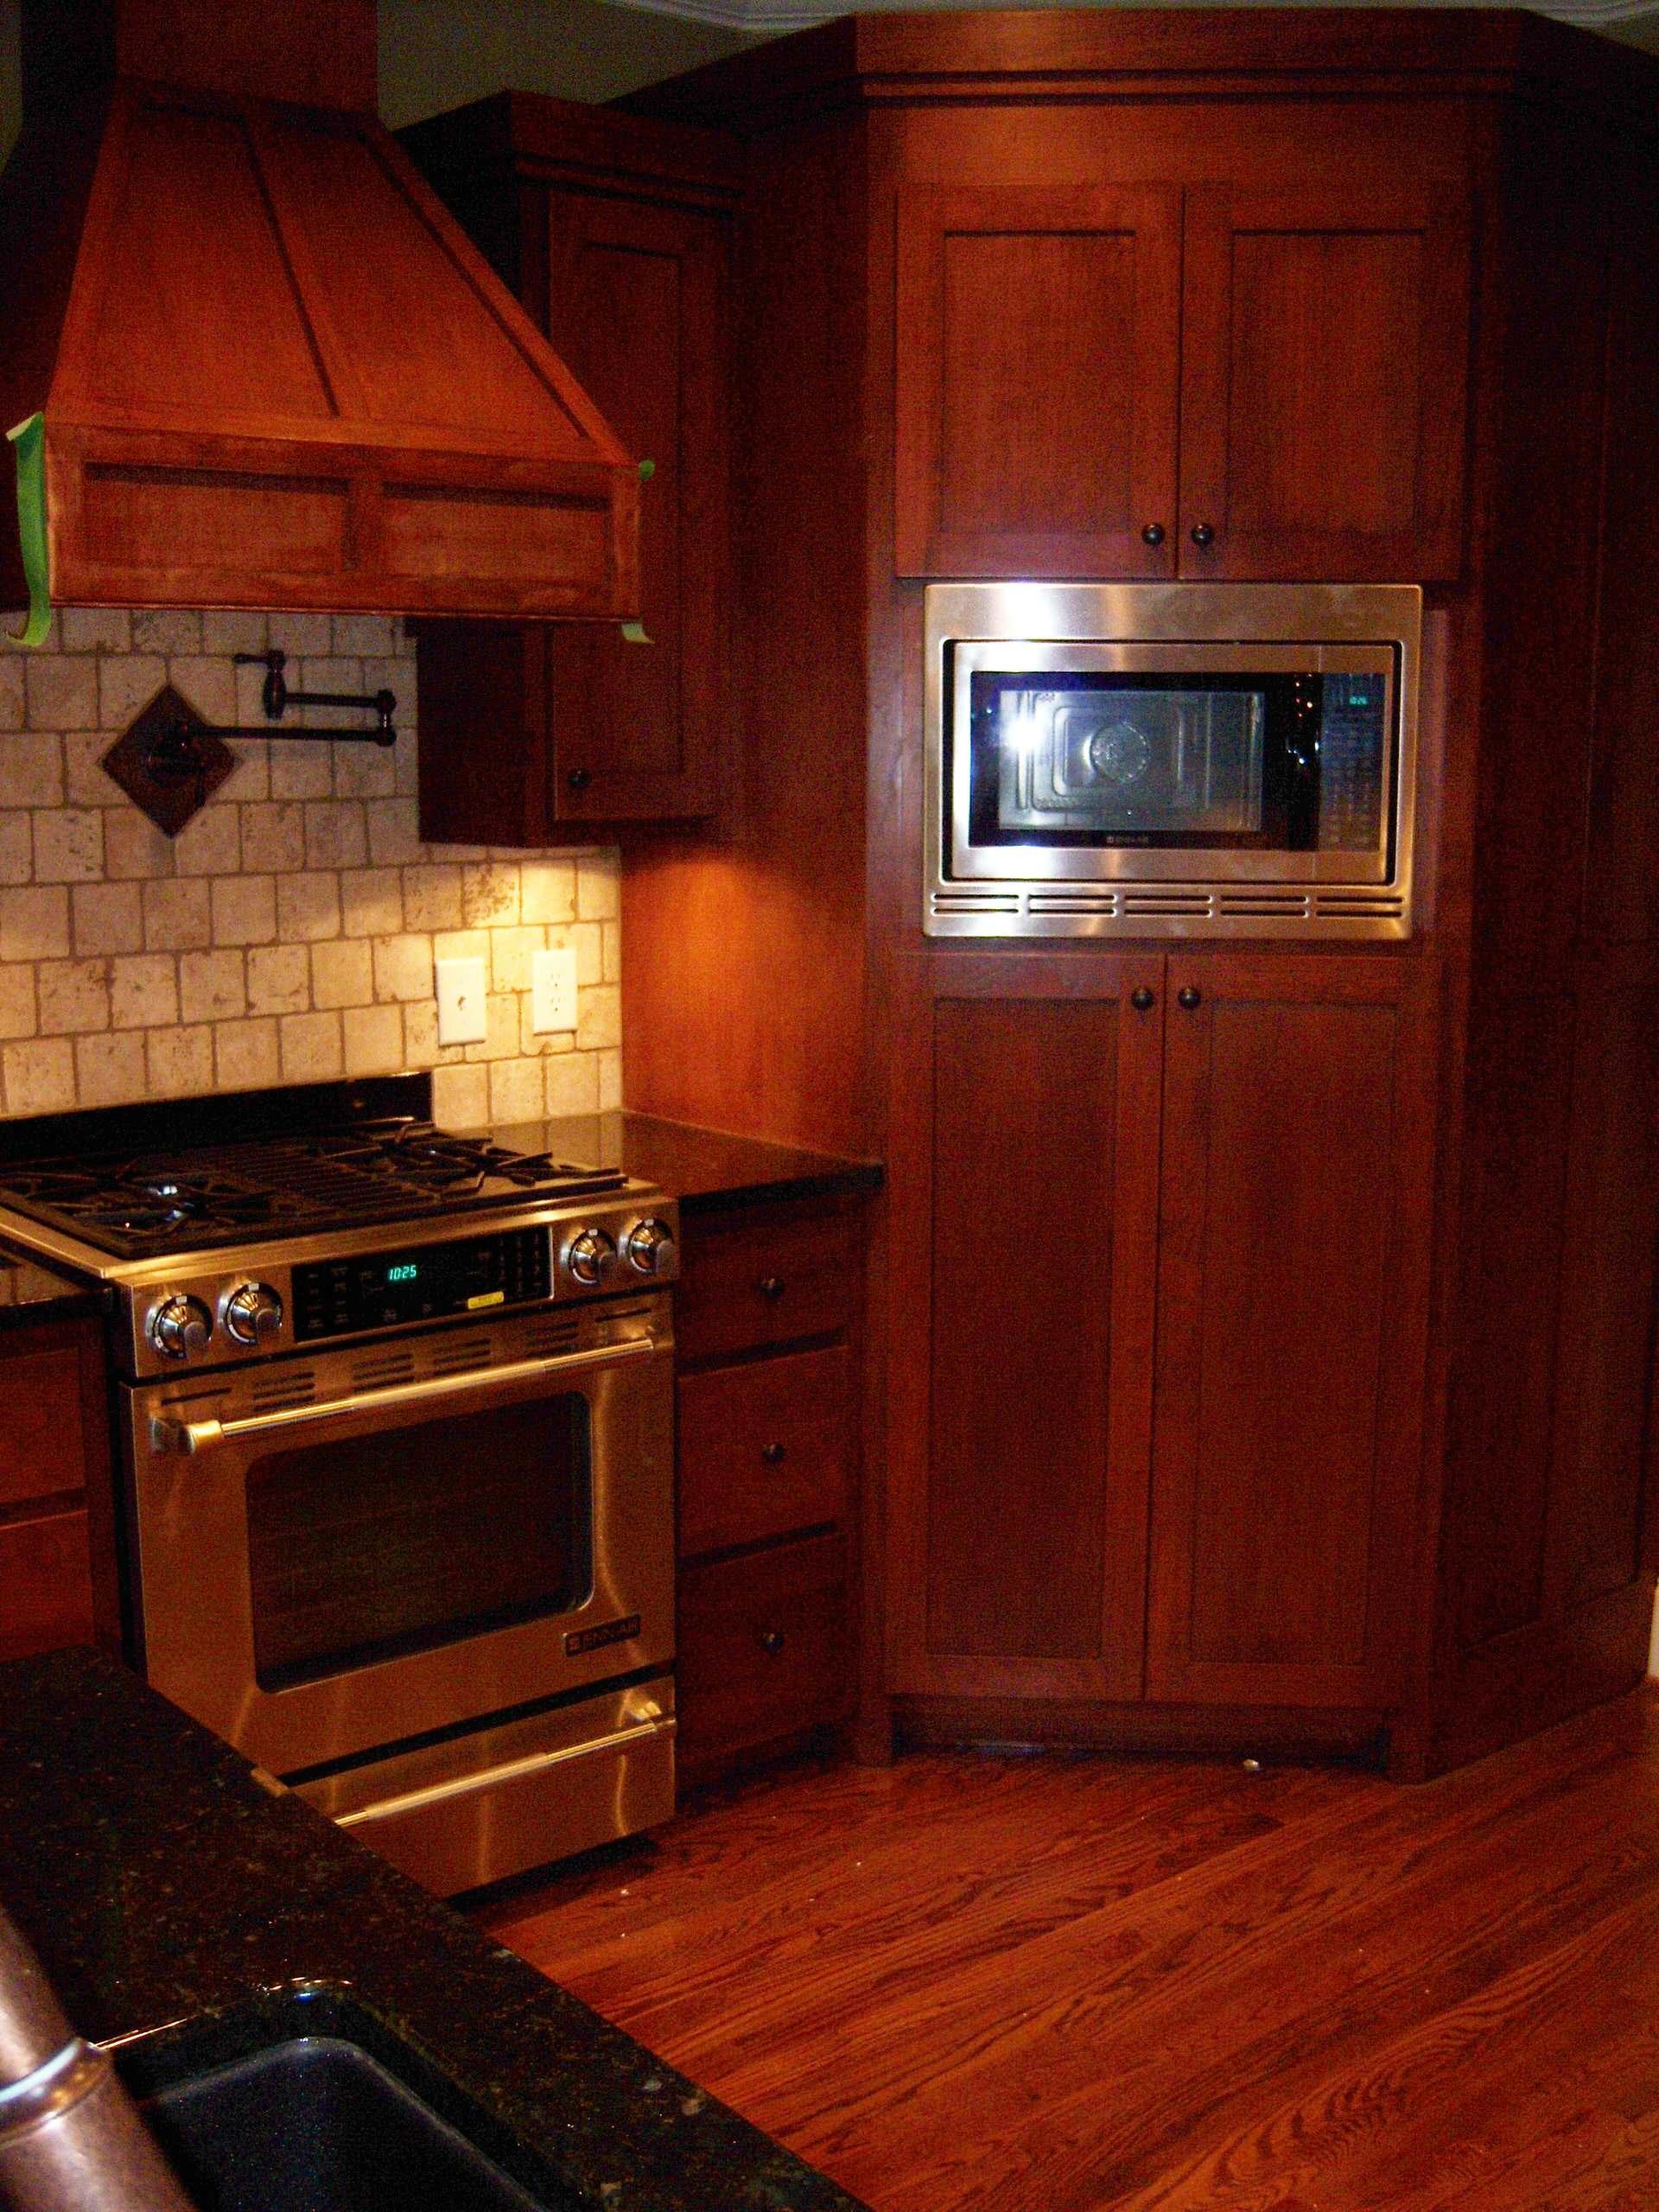 Pantry Cabinet, Pot Filler Valve, Slide In Range